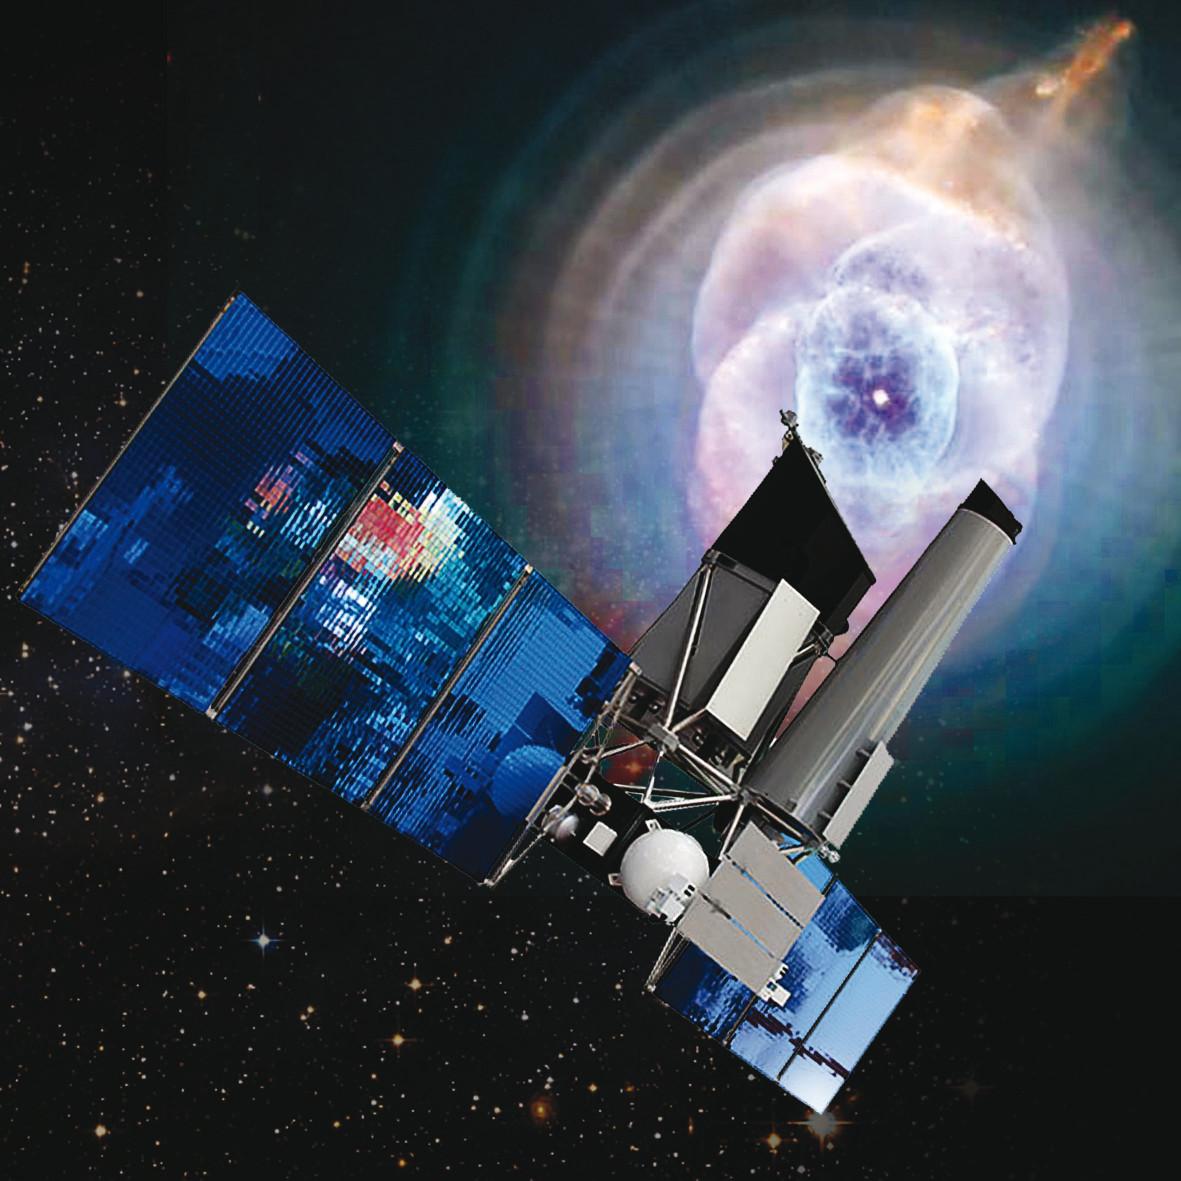 The Russian-German space probe Spektrum-Roentgen-Gamma in space